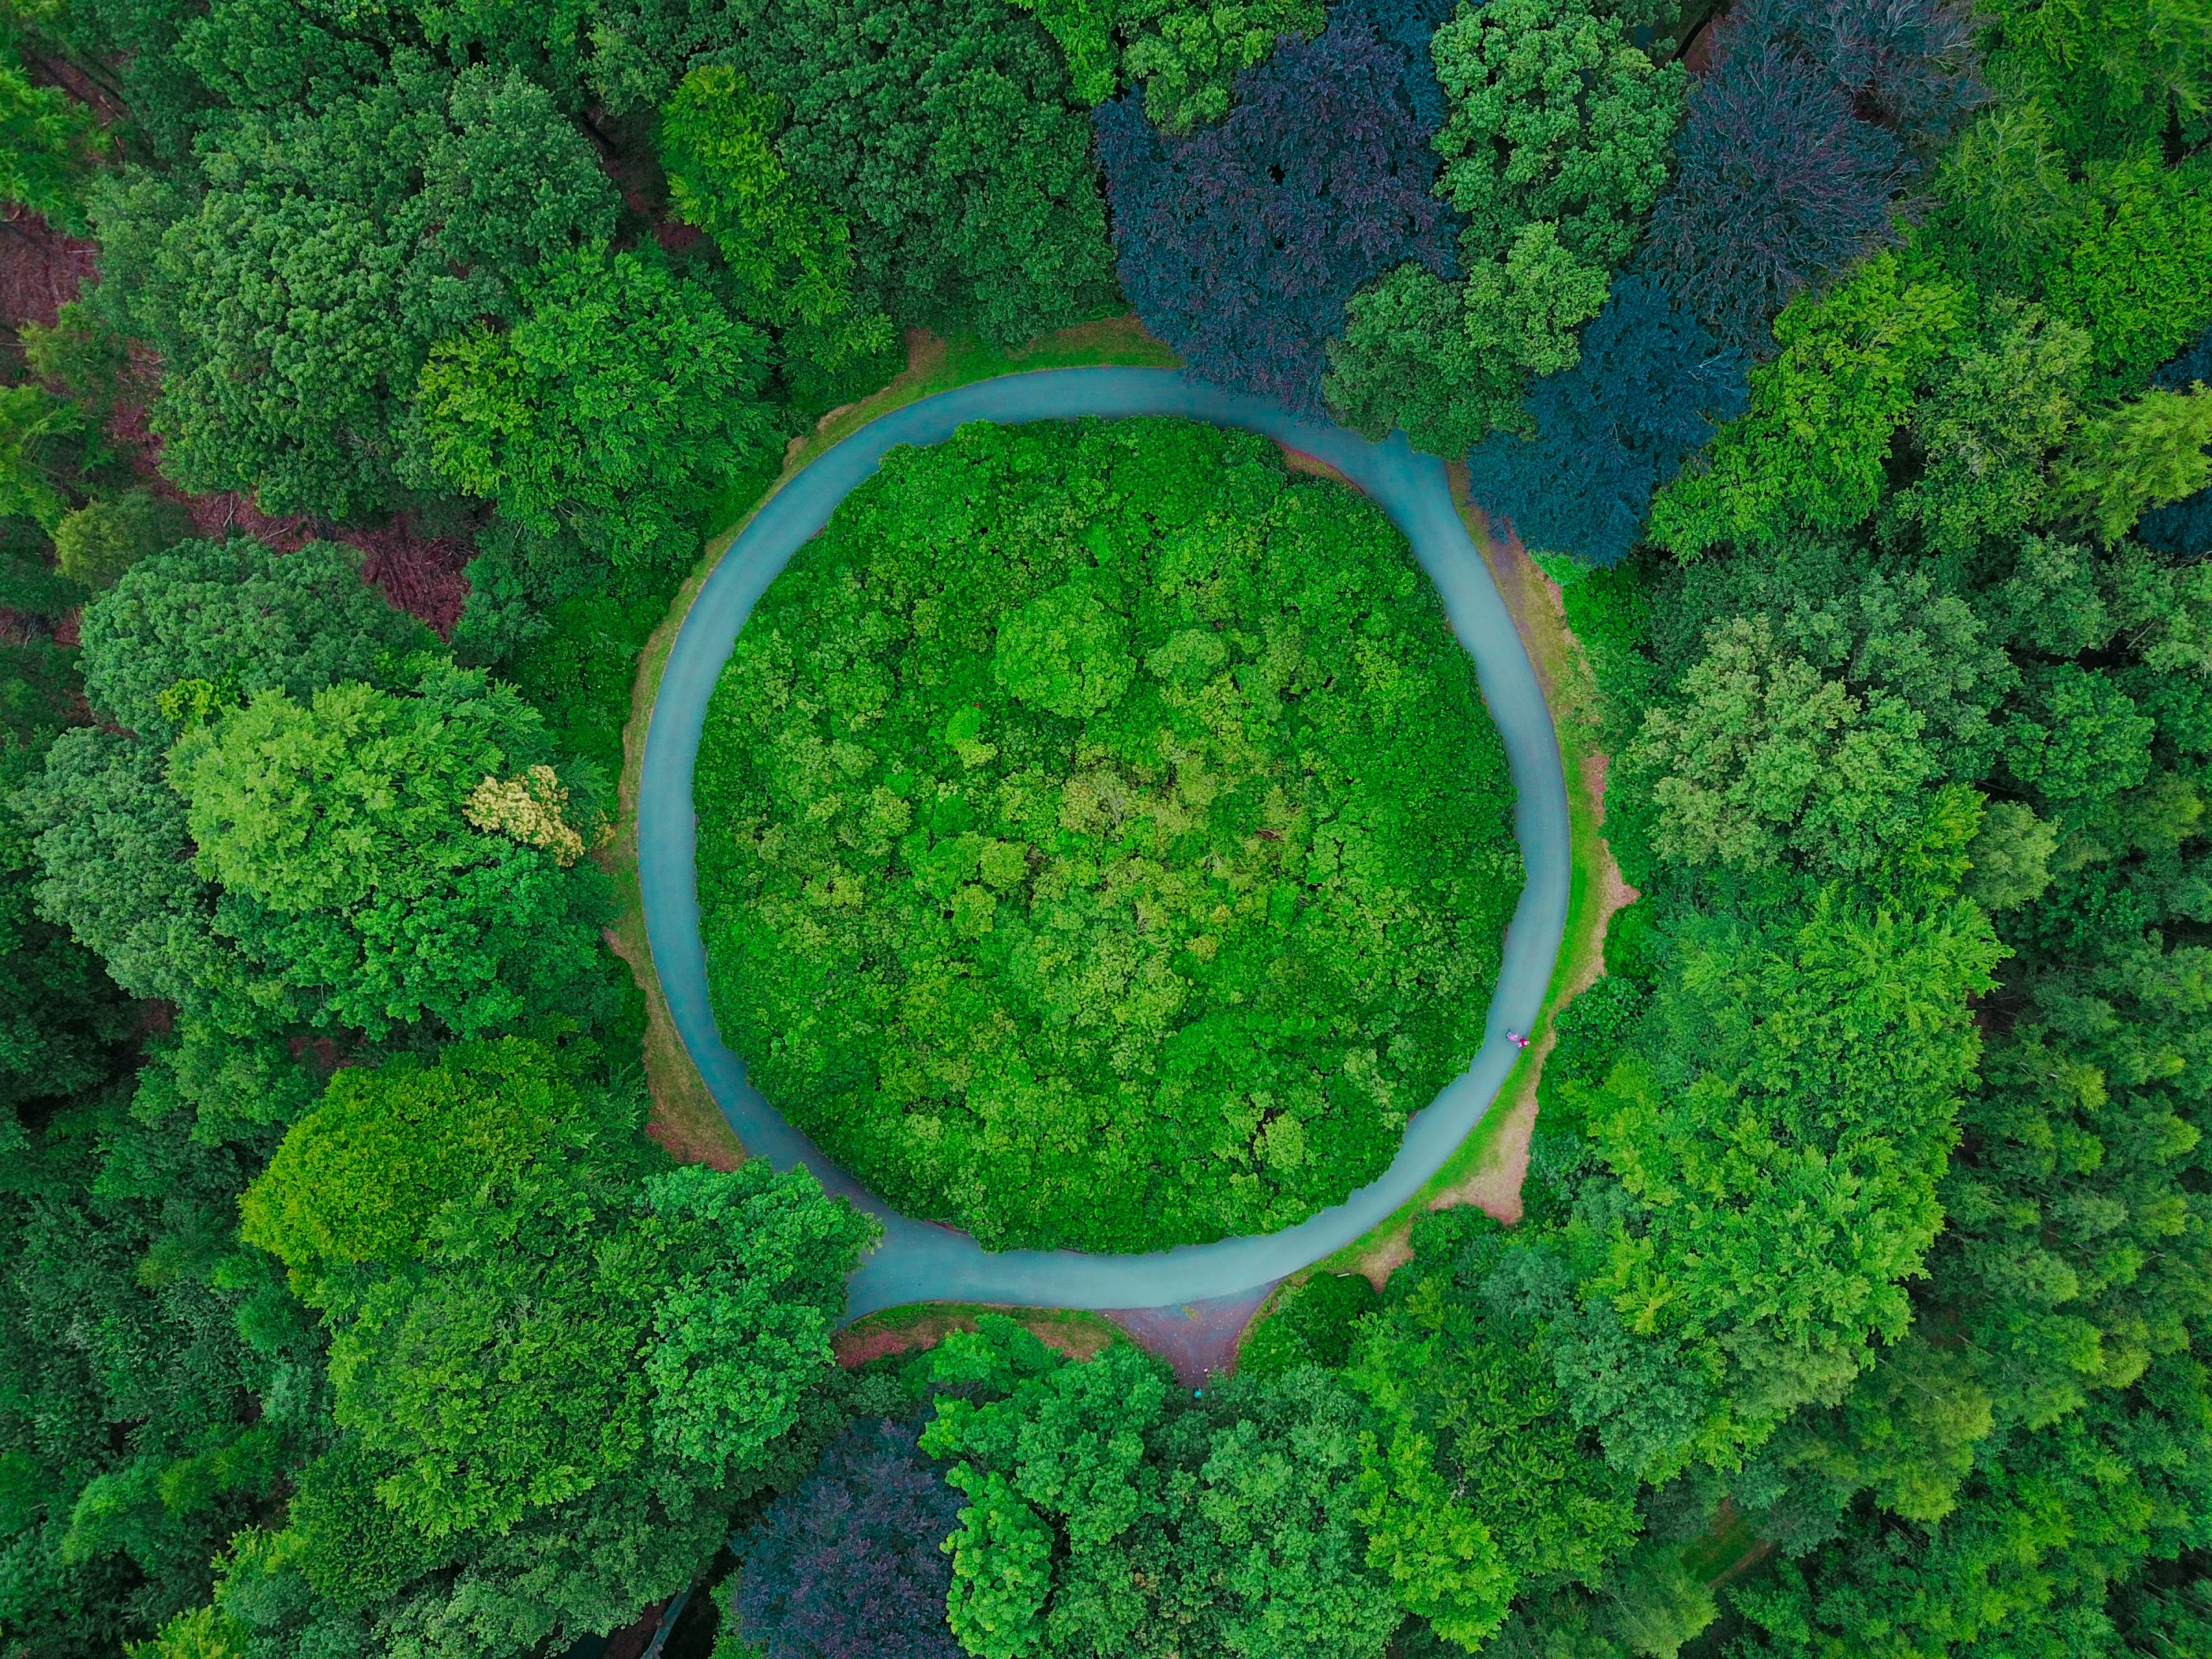 IEA Bioenergie Task 42: Working Period 2019 – 2021